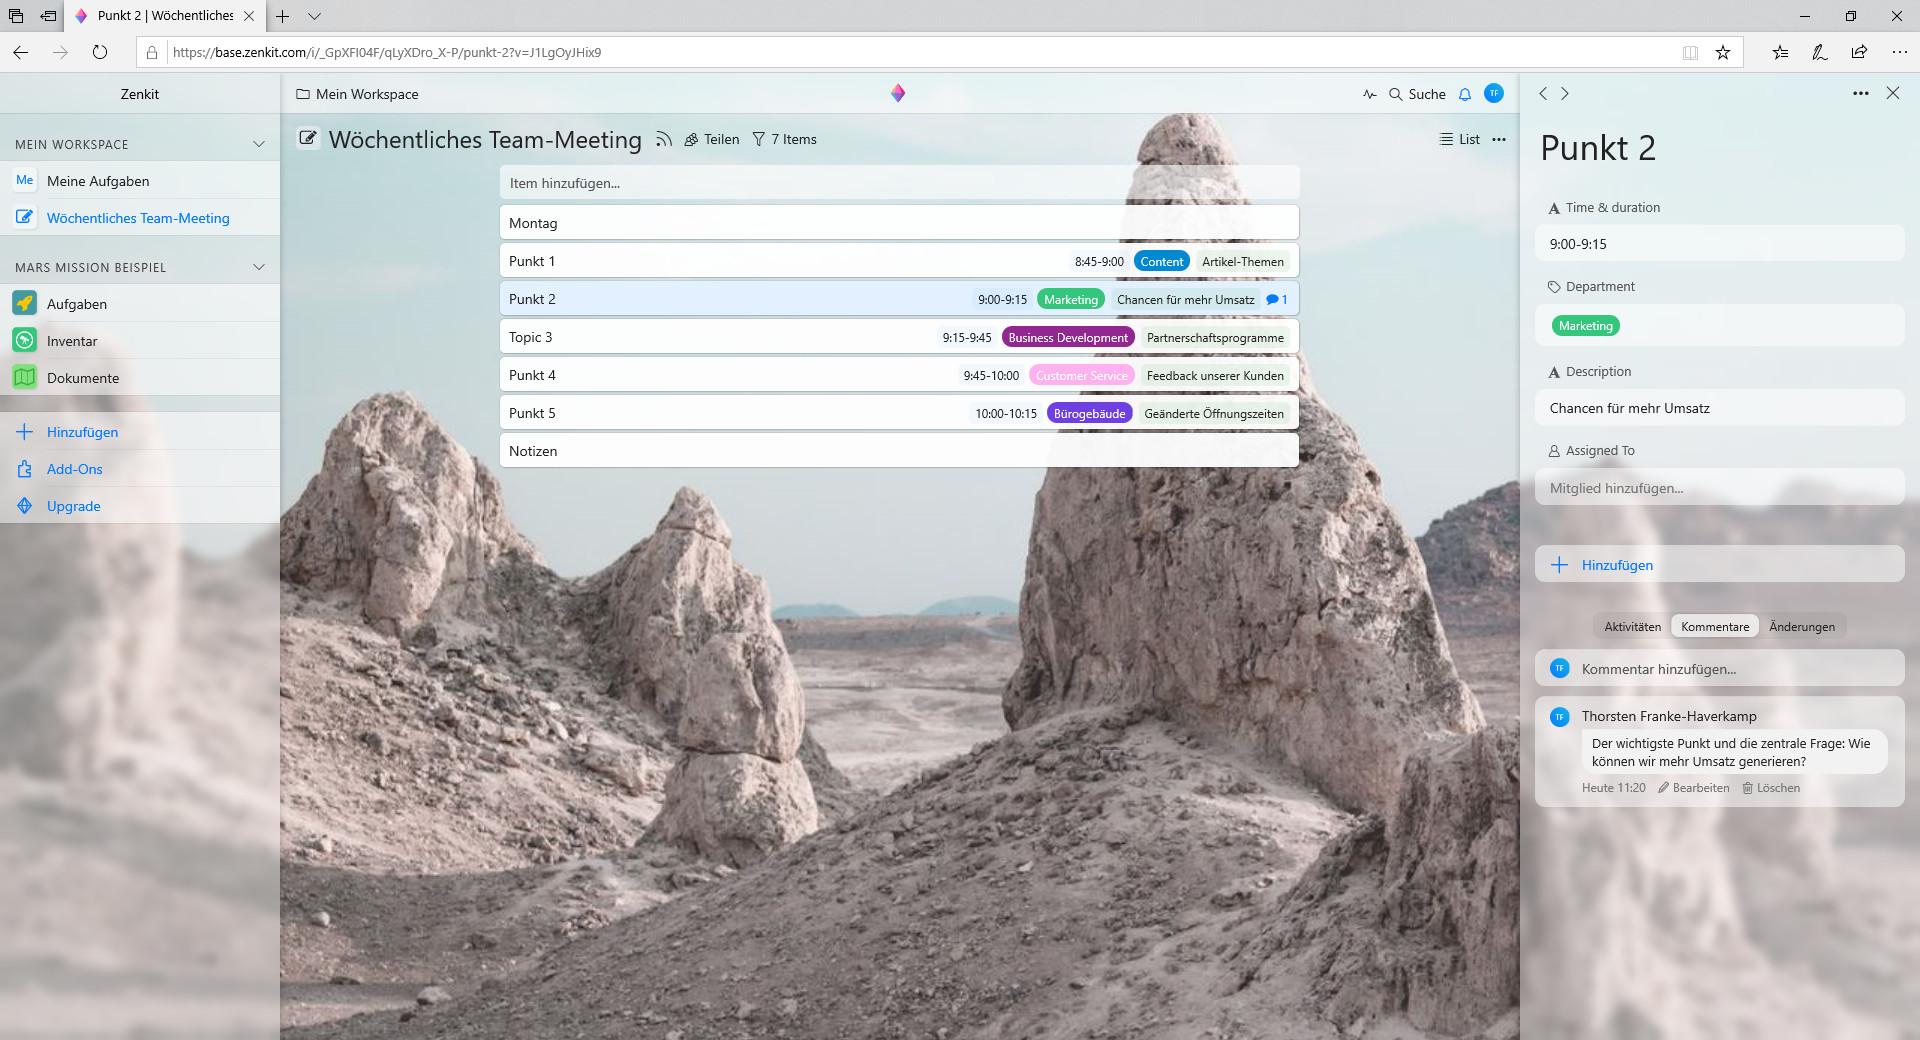 Screenshot 1 - Zenkit Base